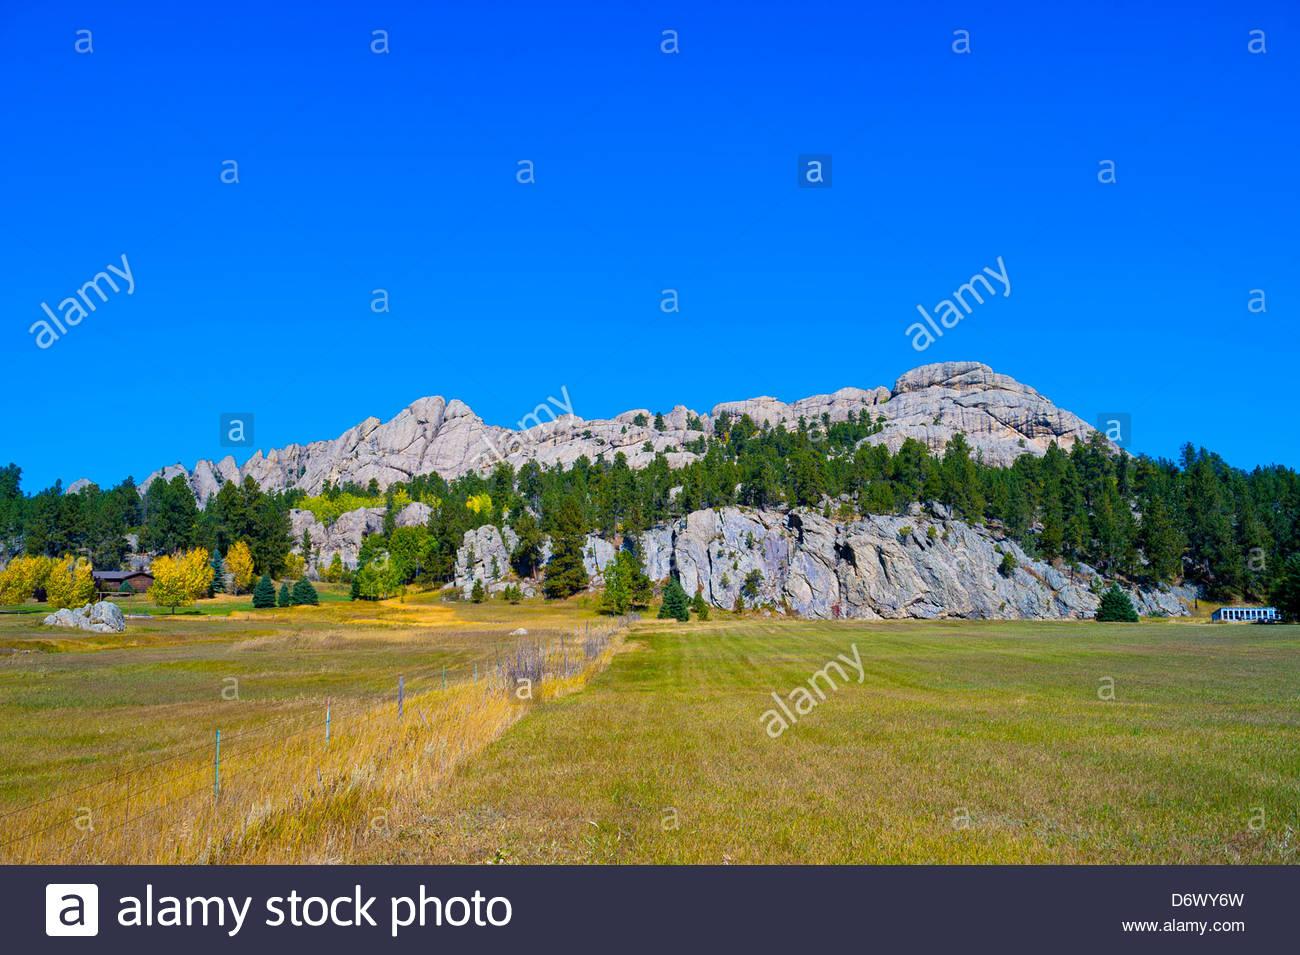 Outlaw Ranch, near Custer (Black Hills), South Dakota USA - Stock Image